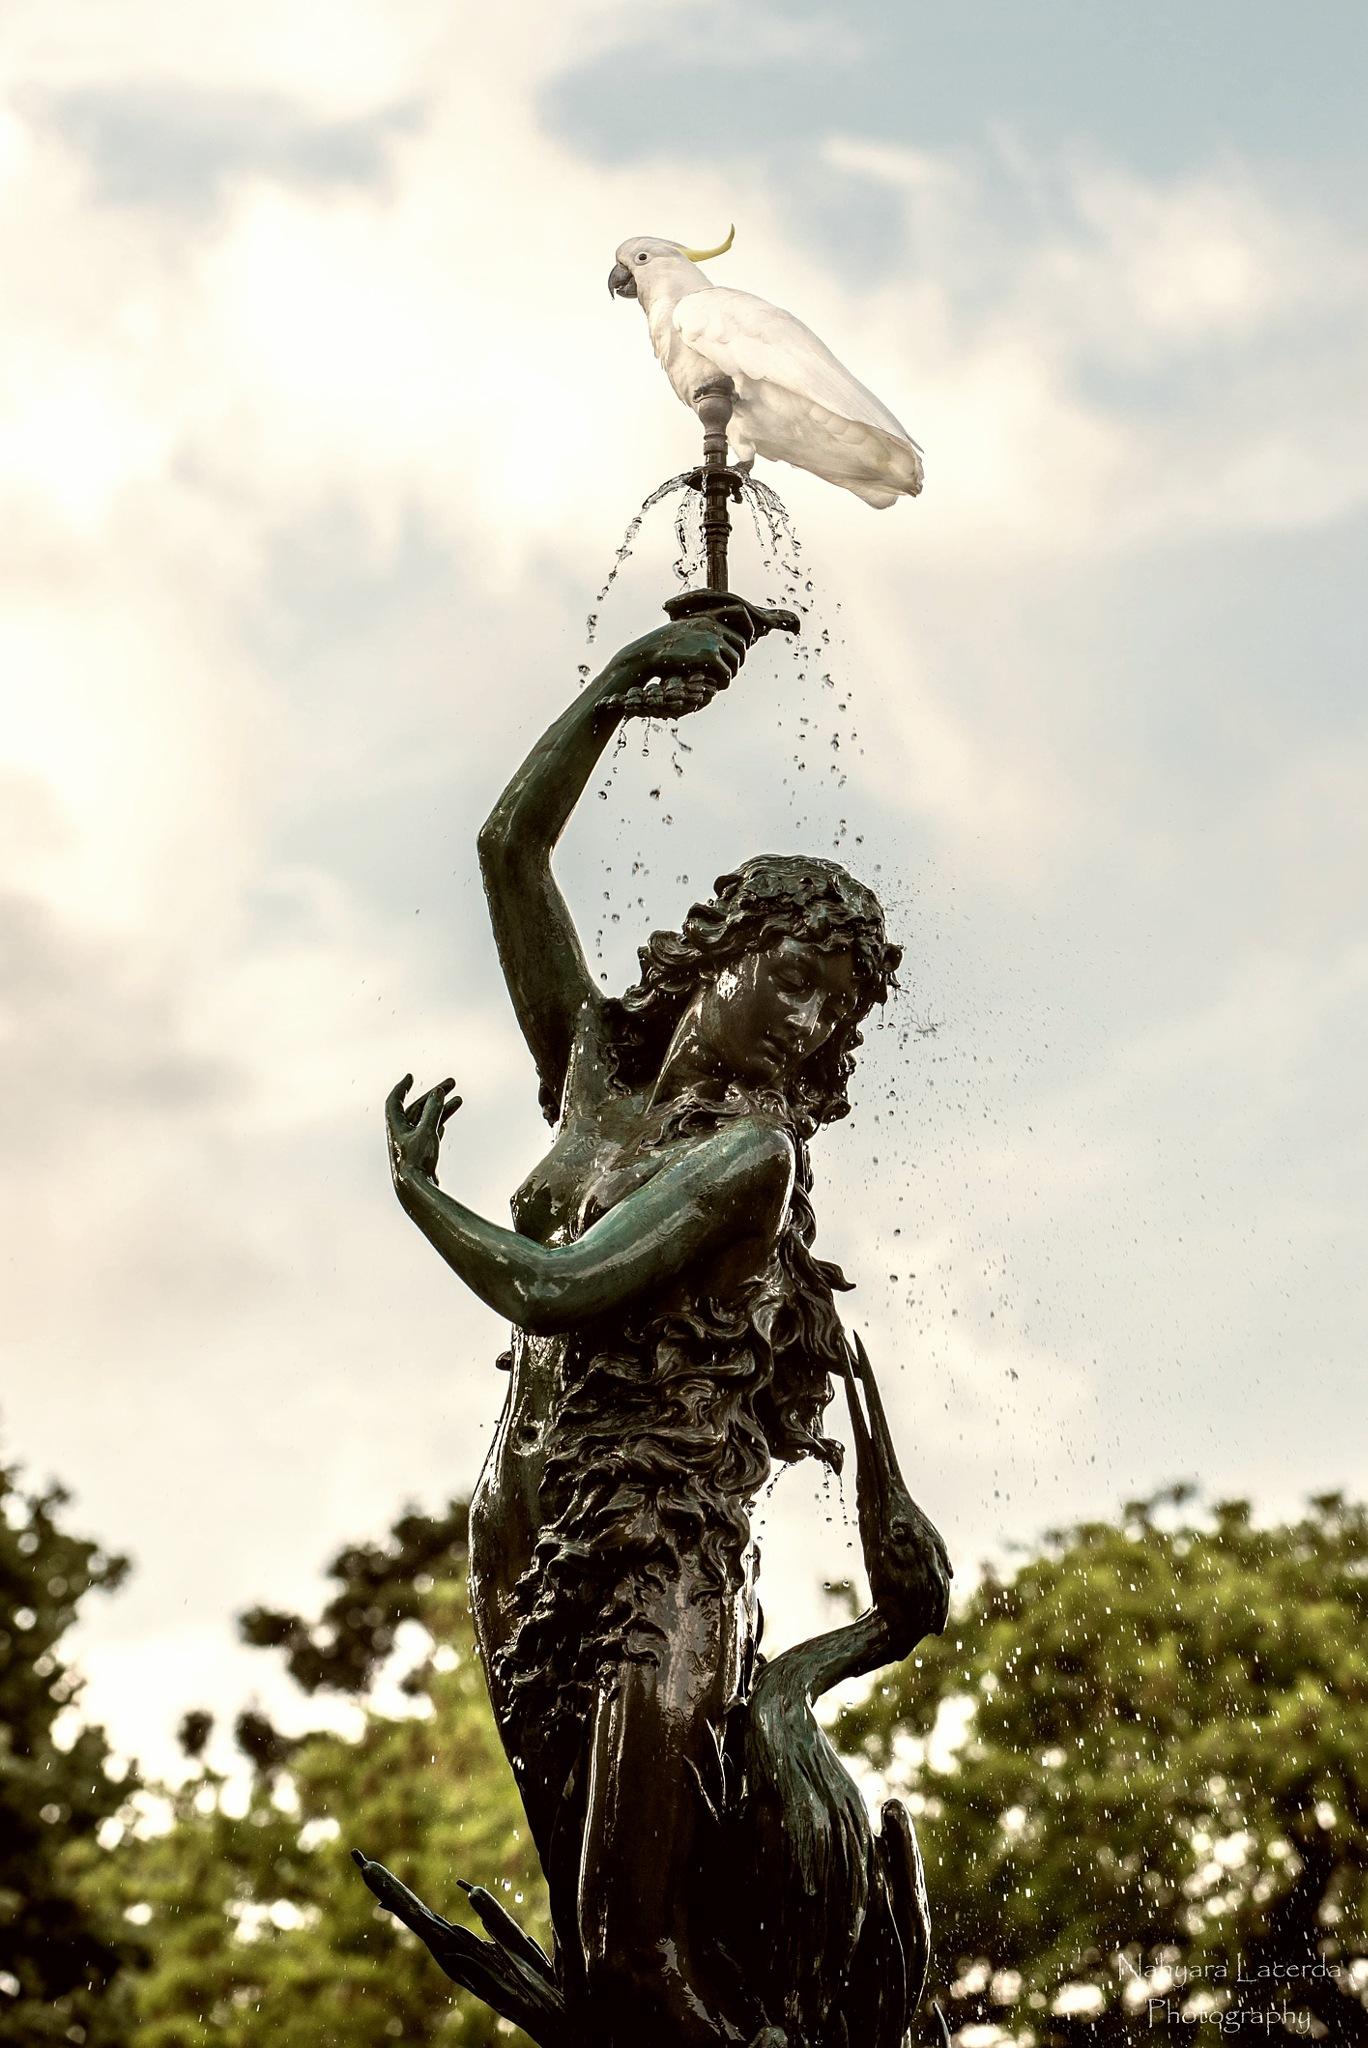 Lewis Wolfe Levy Fountain. Royal Botanic Gardens, Sydney, Australia by NahyaraLacerda